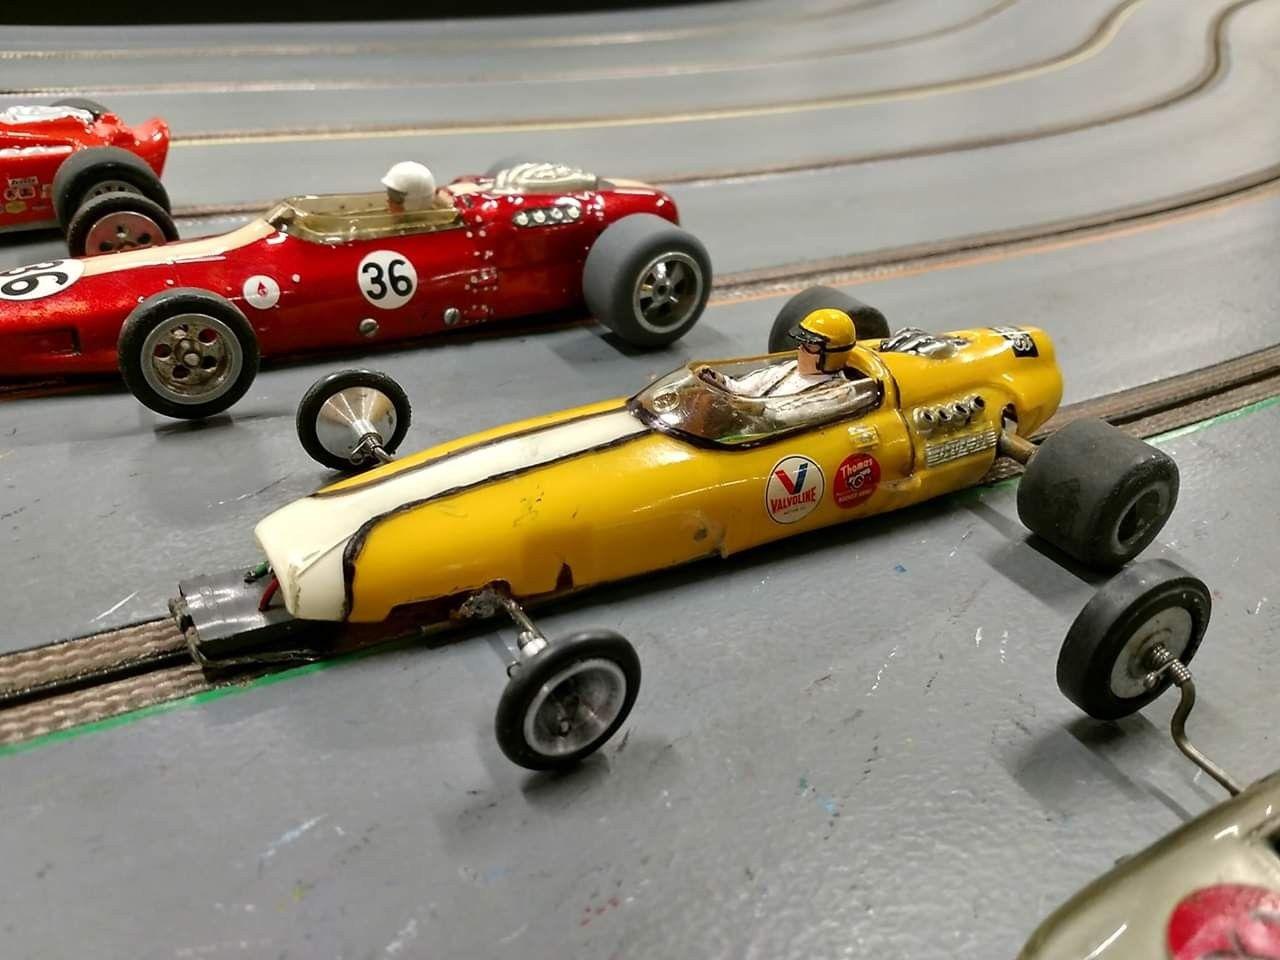 Pin By Marcos Vieira Lobo On Slot Cars Slot Cars Slot Racing Slot